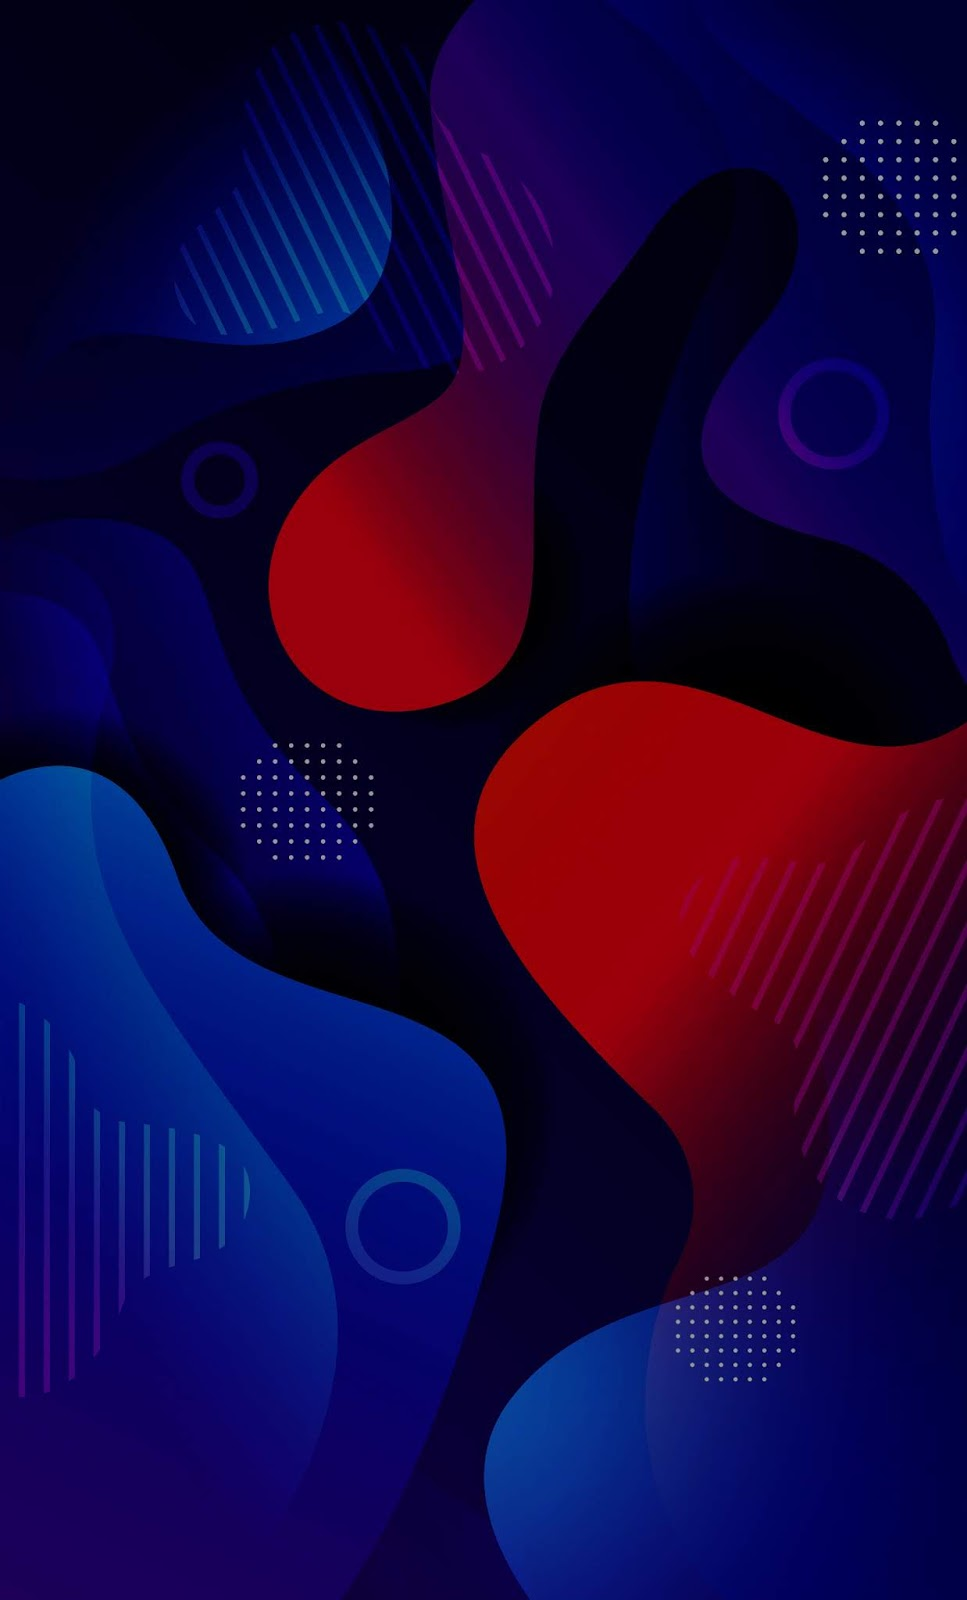 Abstract Wallpaper Phone 2576906 Hd Wallpaper Backgrounds